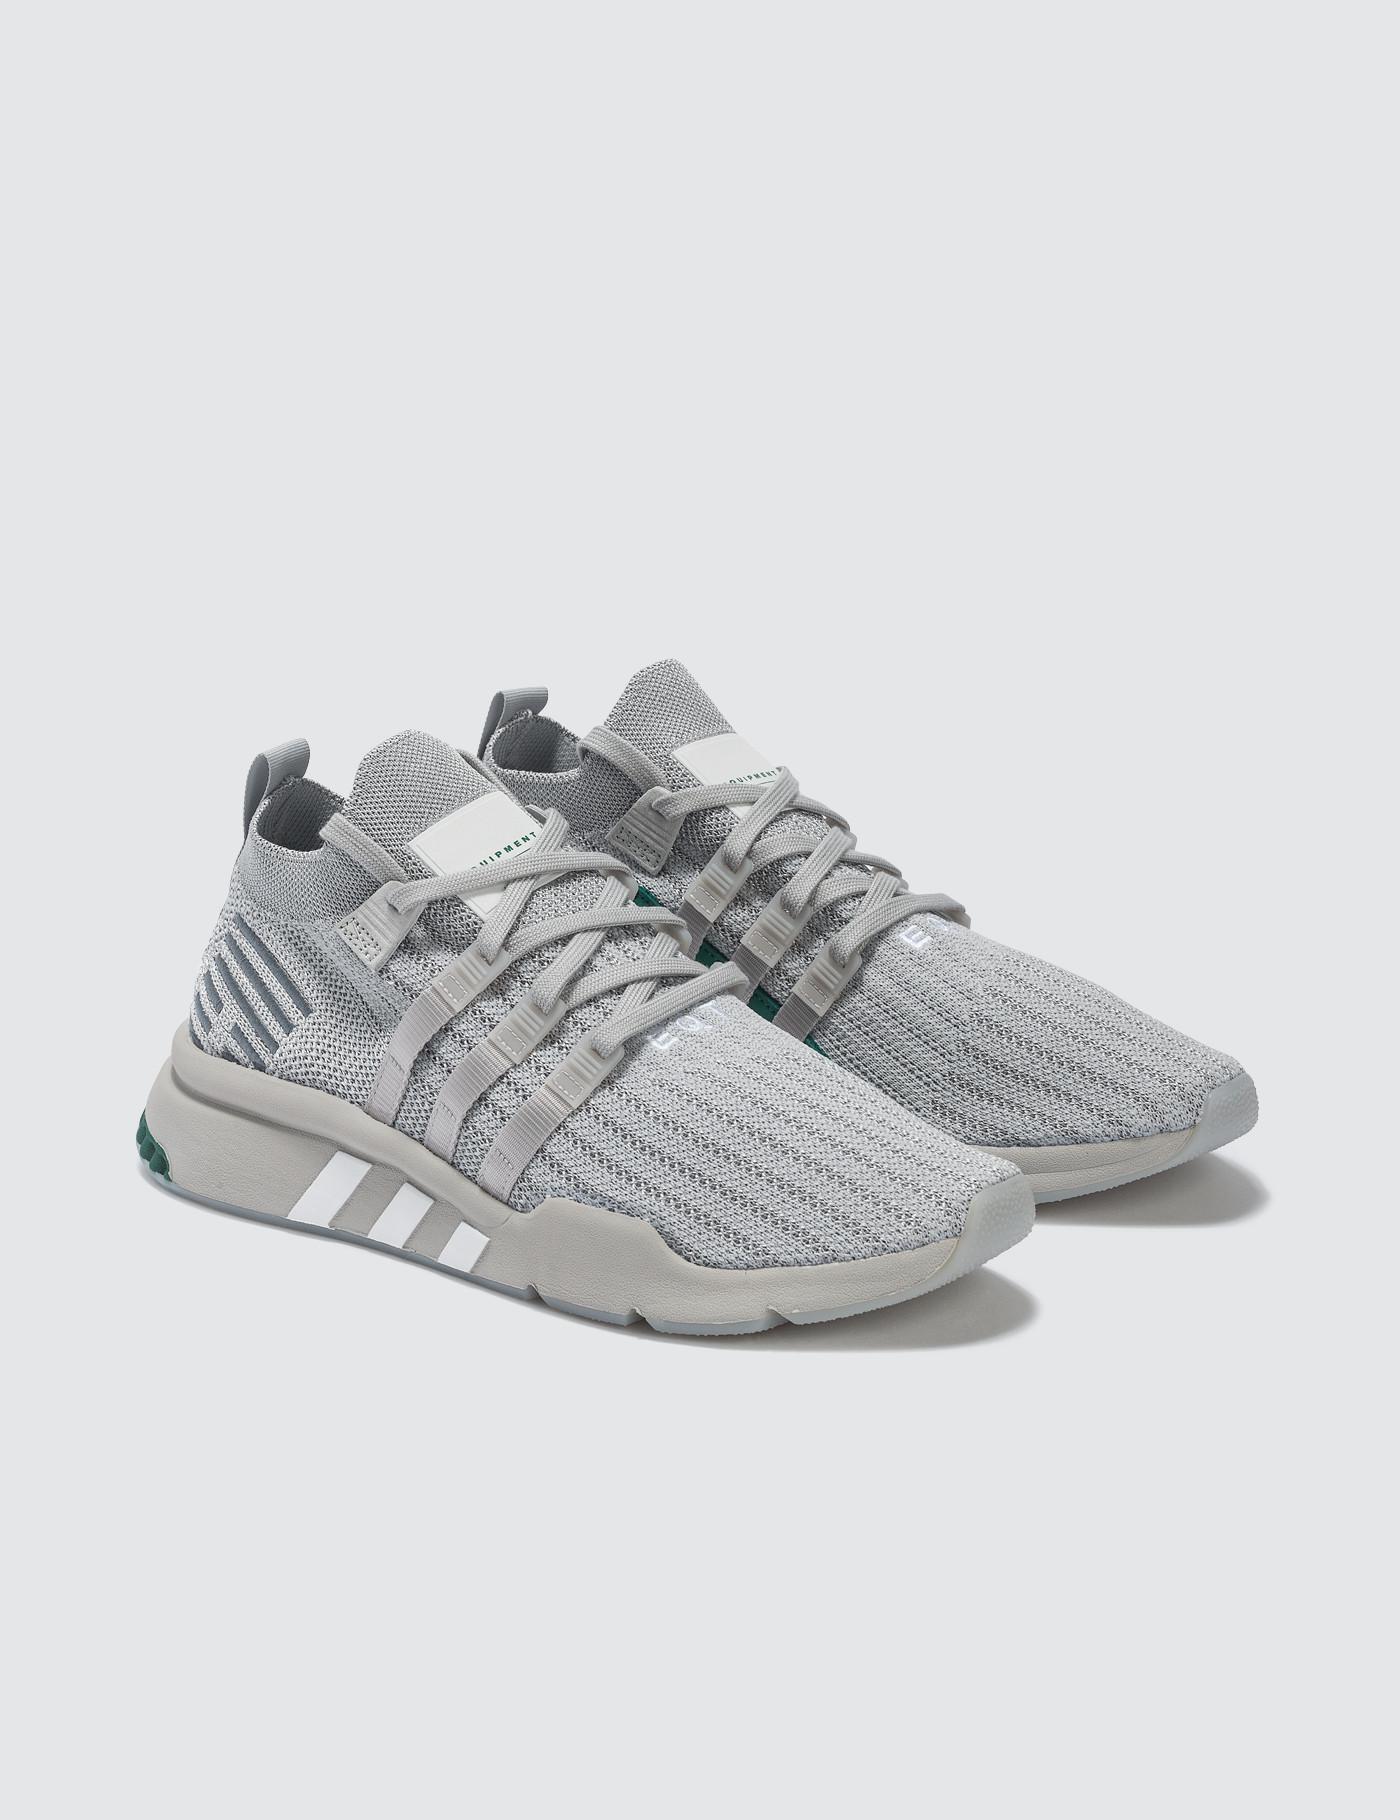 adidas Originals Lace Eqt Support Mid Adv Primeknit in Grey (Grey) for Men